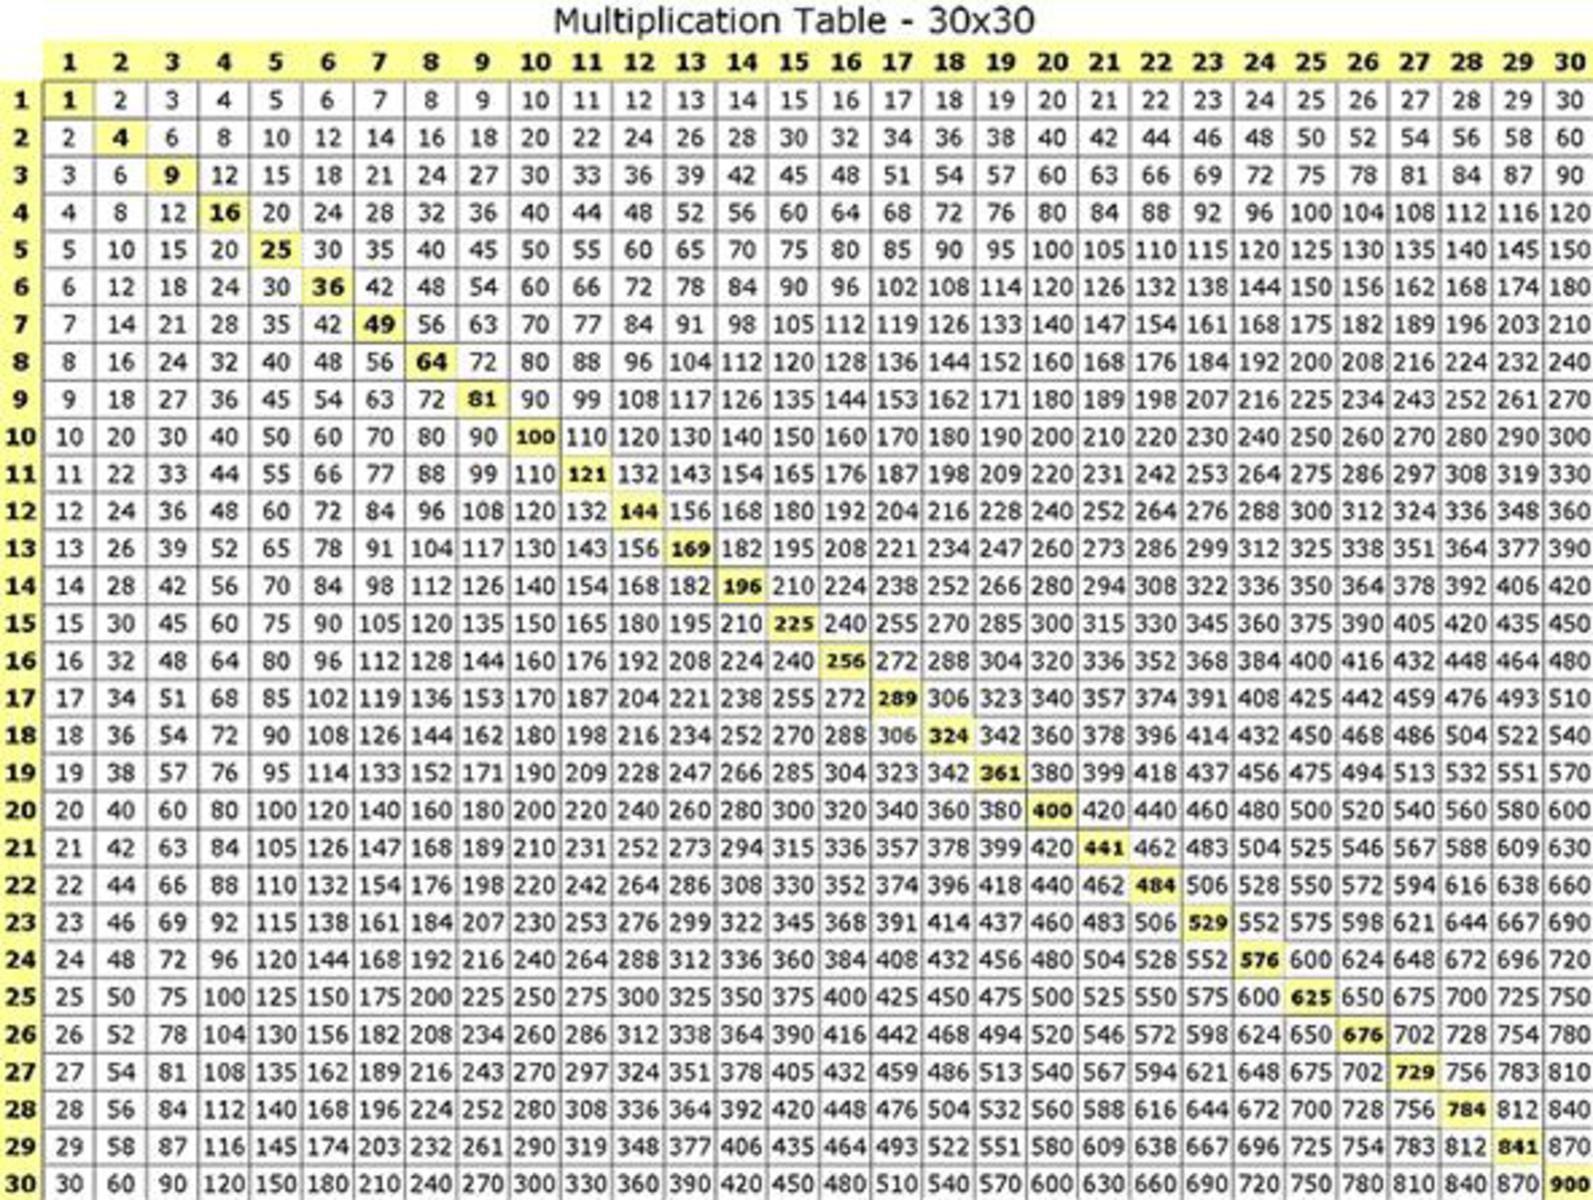 Multiplication Table Printable | Multiplication Table